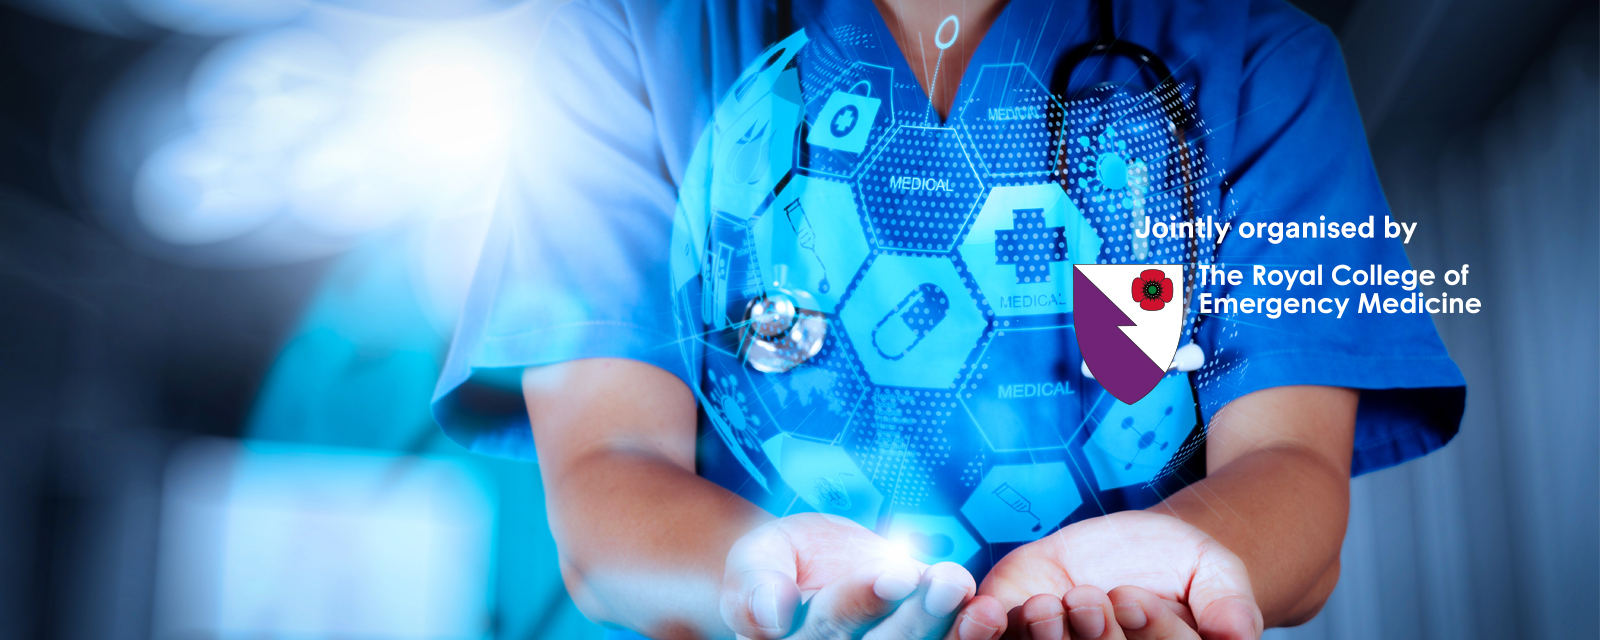 Emergency medicine worldwide: The roles of partnerships